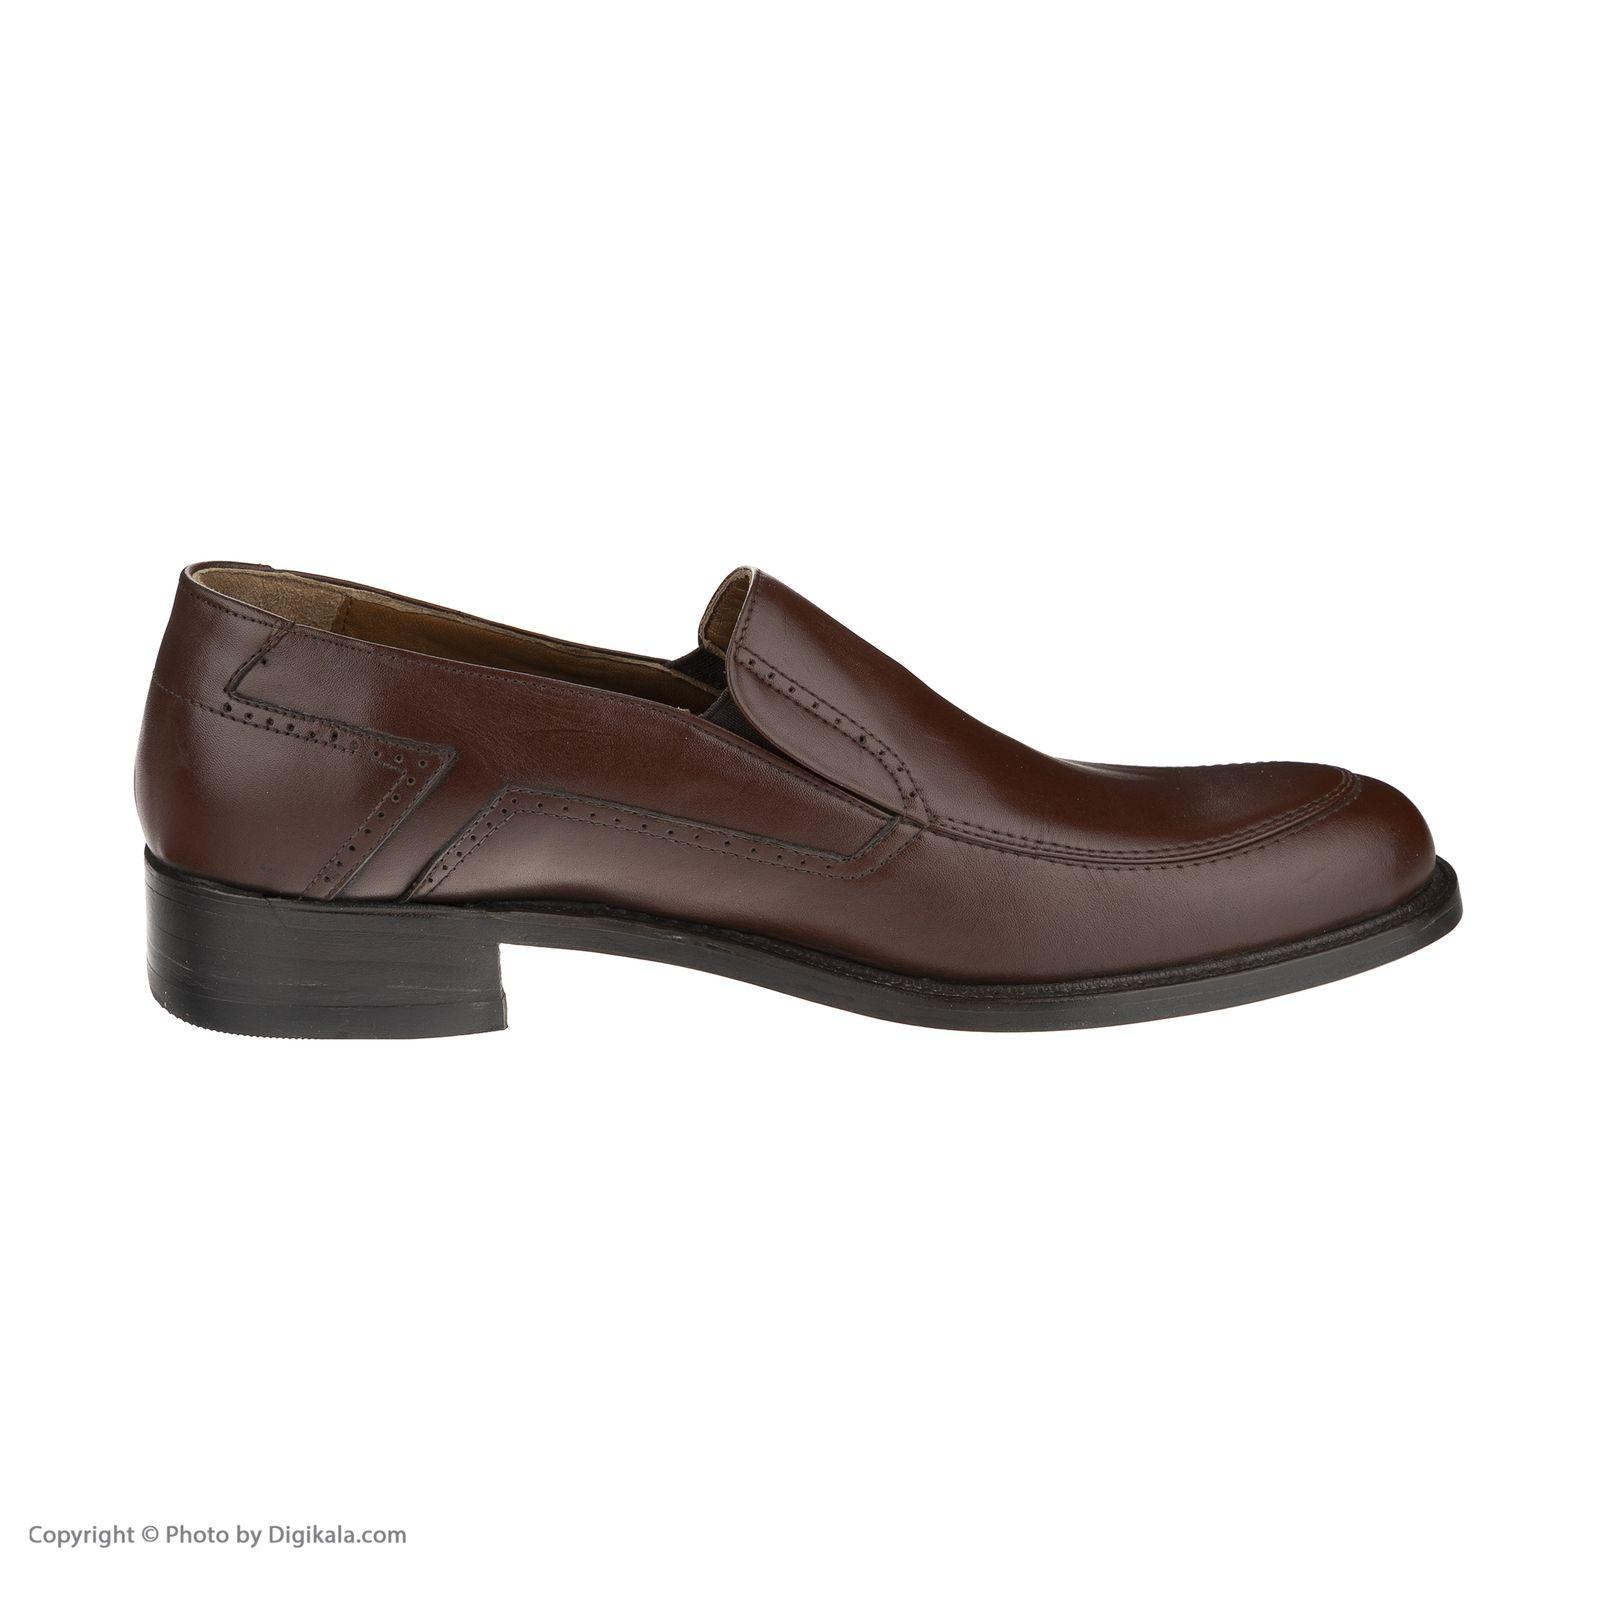 کفش مردانه نظری کد 434 -  - 4